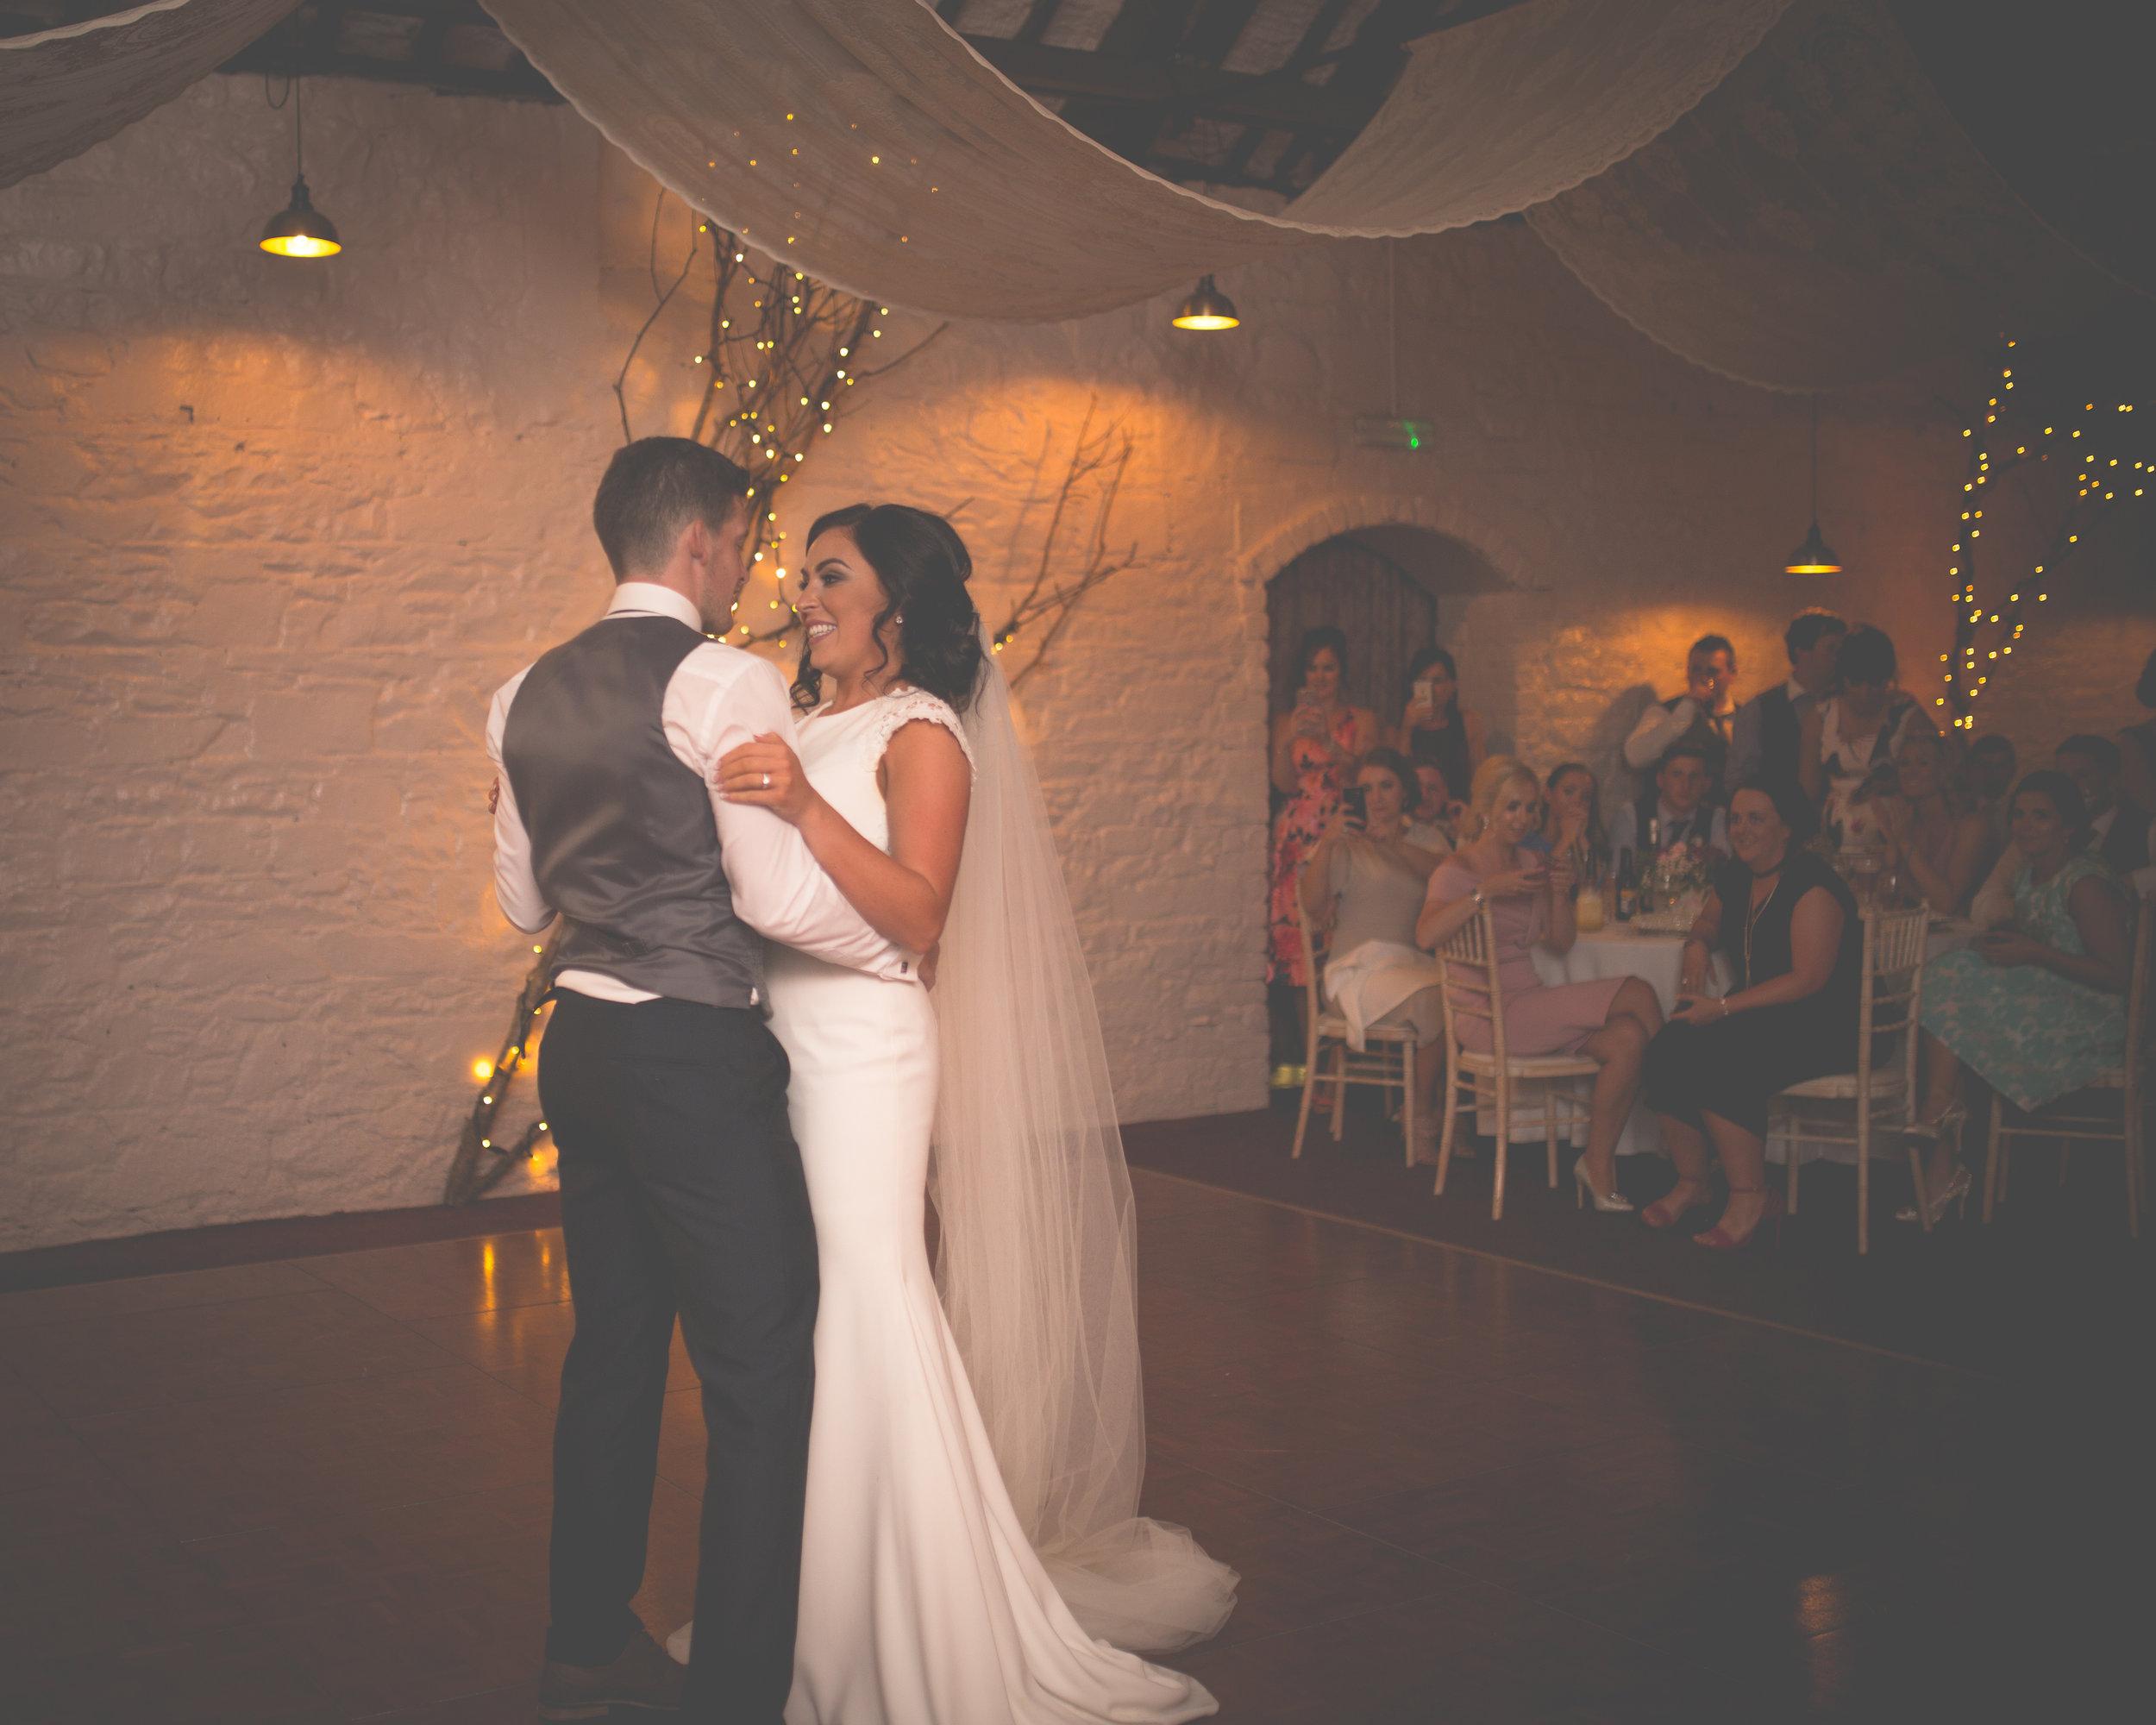 Brian McEwan Wedding Photography | Carol-Annee & Sean | The Dancing-21.jpg